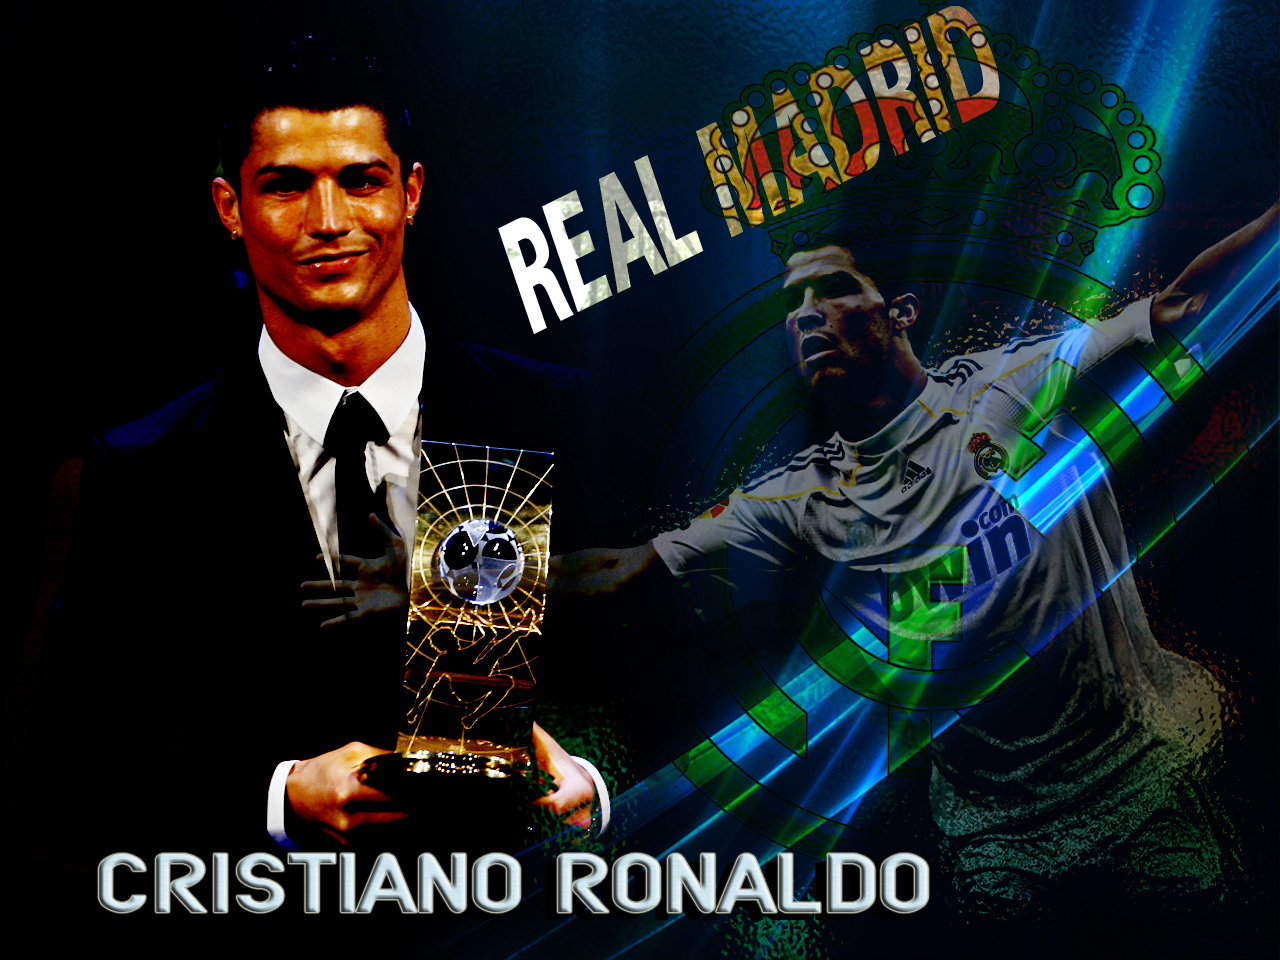 http://4.bp.blogspot.com/_dYXT-xN--6M/TLtx3Kl6R6I/AAAAAAAAABM/obQ5WjdTrDw/s1600/Cristiano-Ronaldo-Real-Madrid-01.jpg